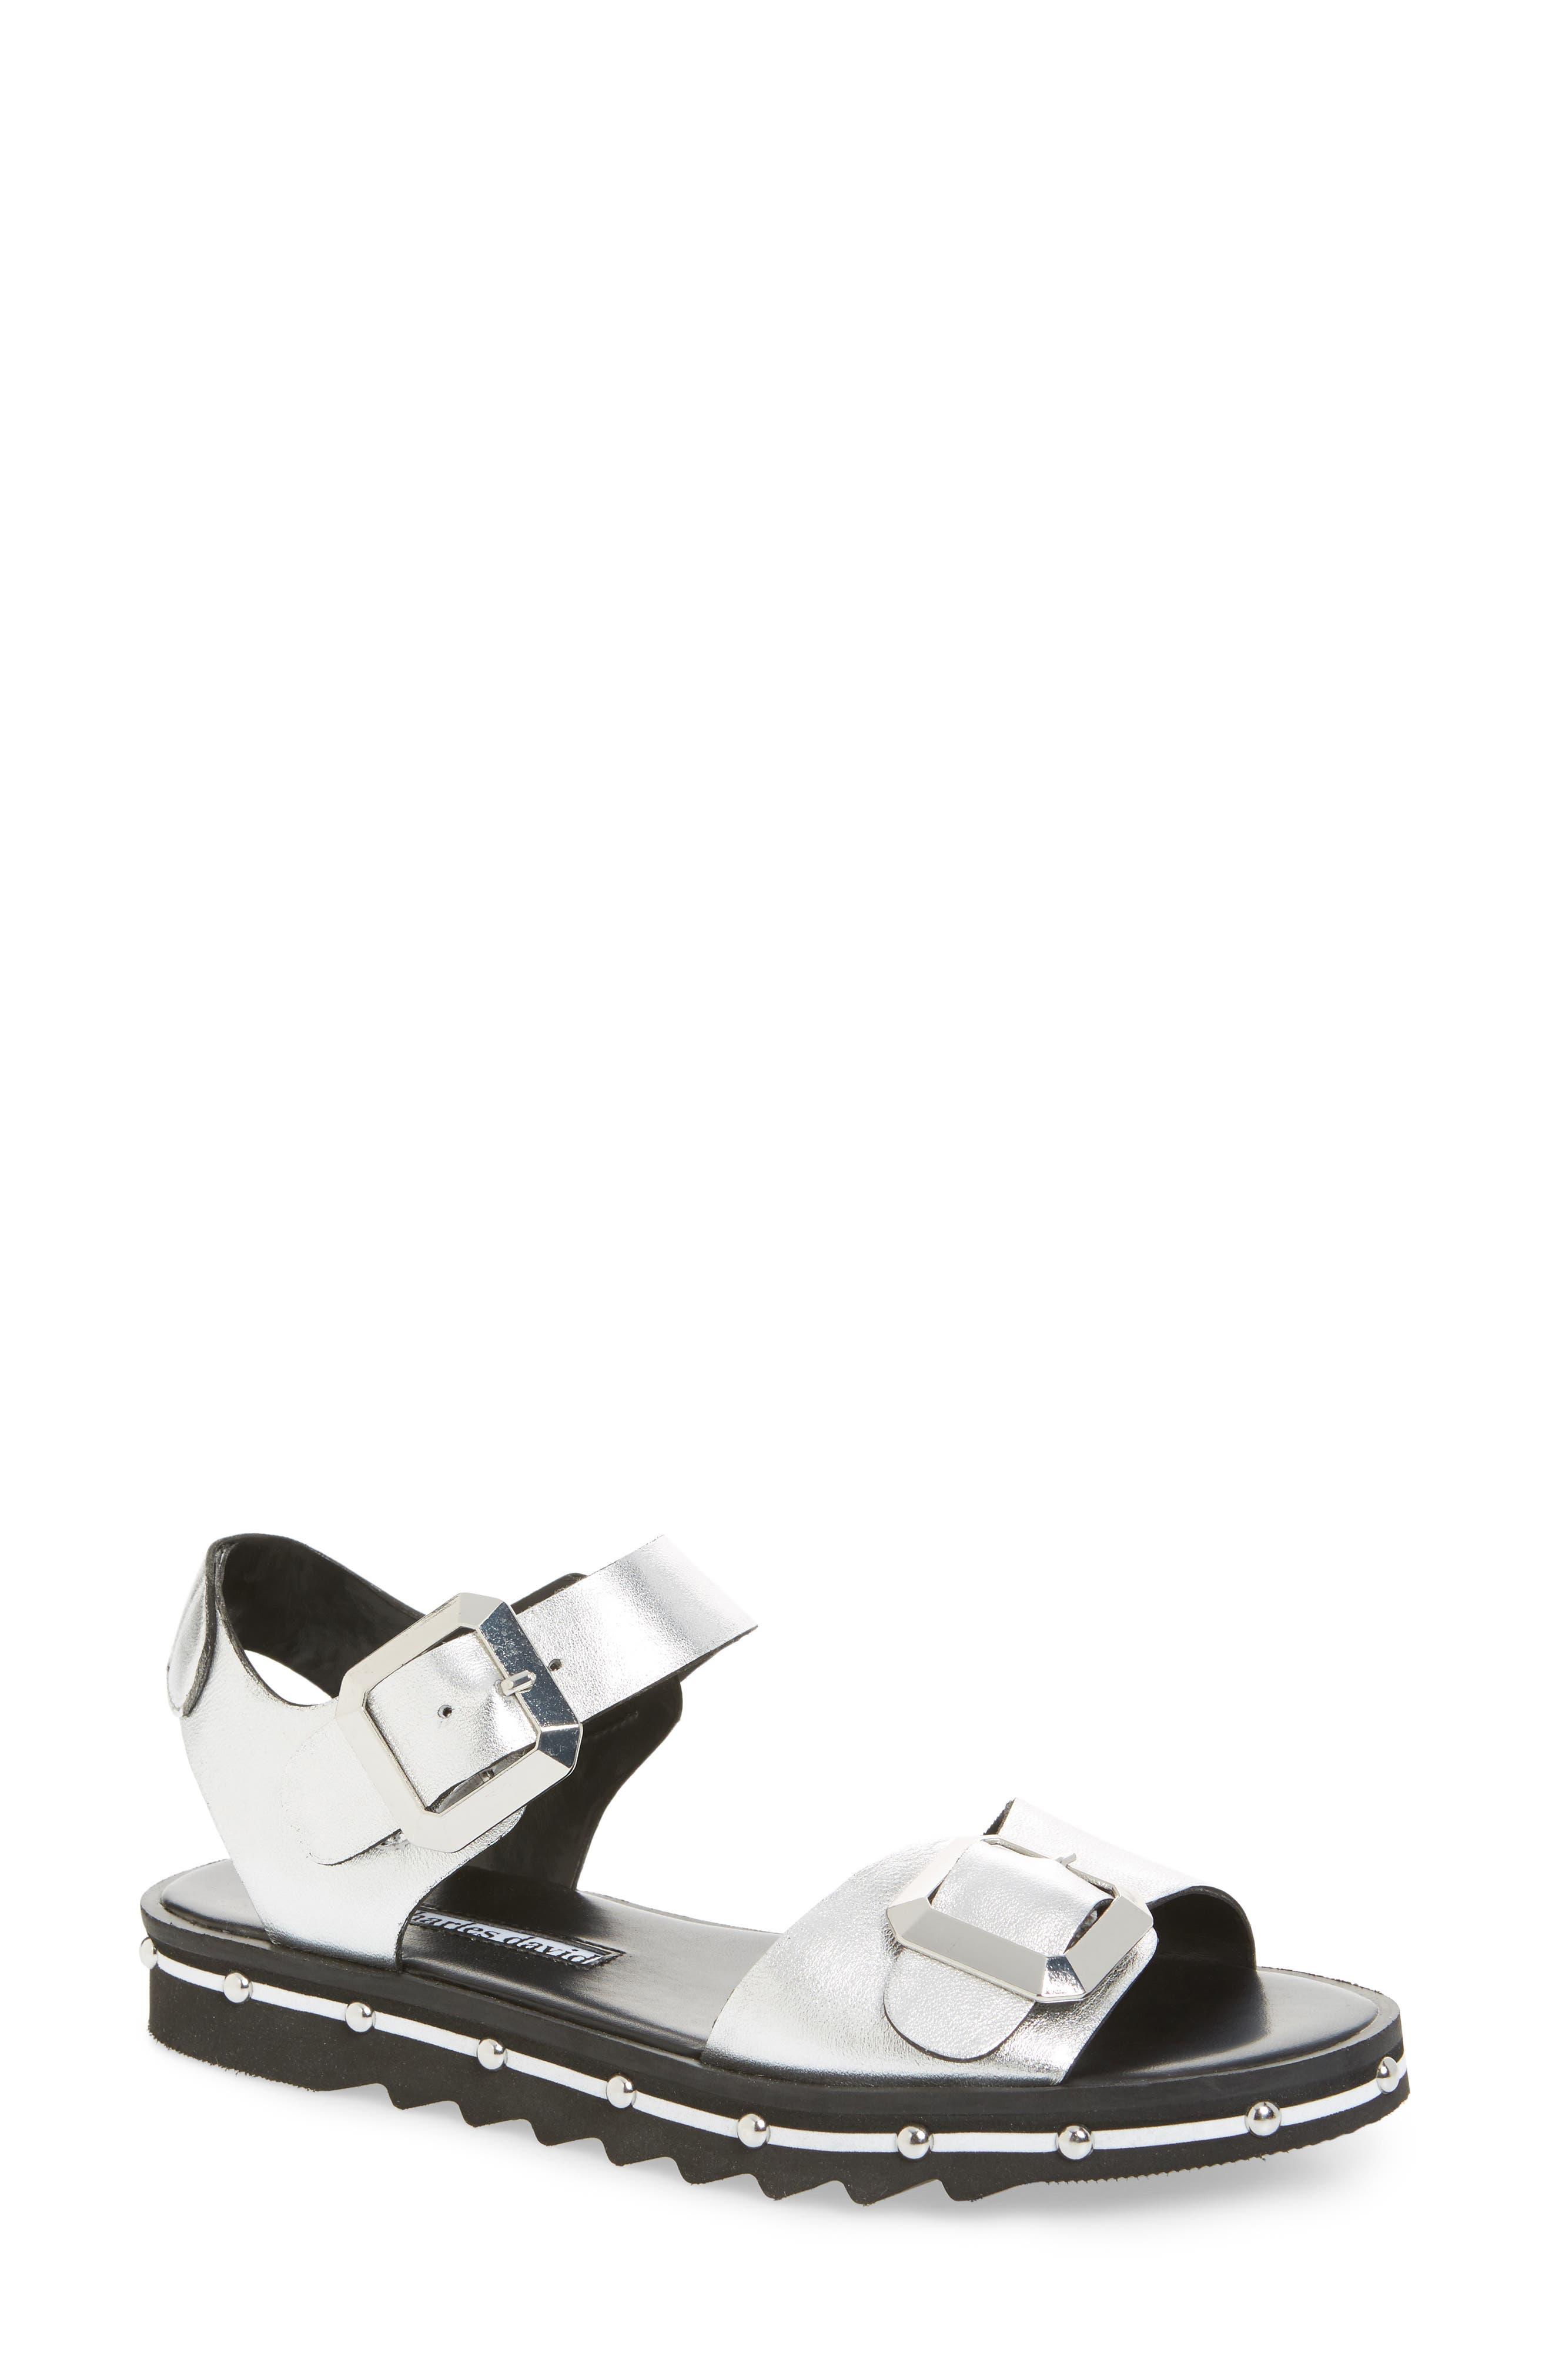 Charles David Spy Sandal- Metallic